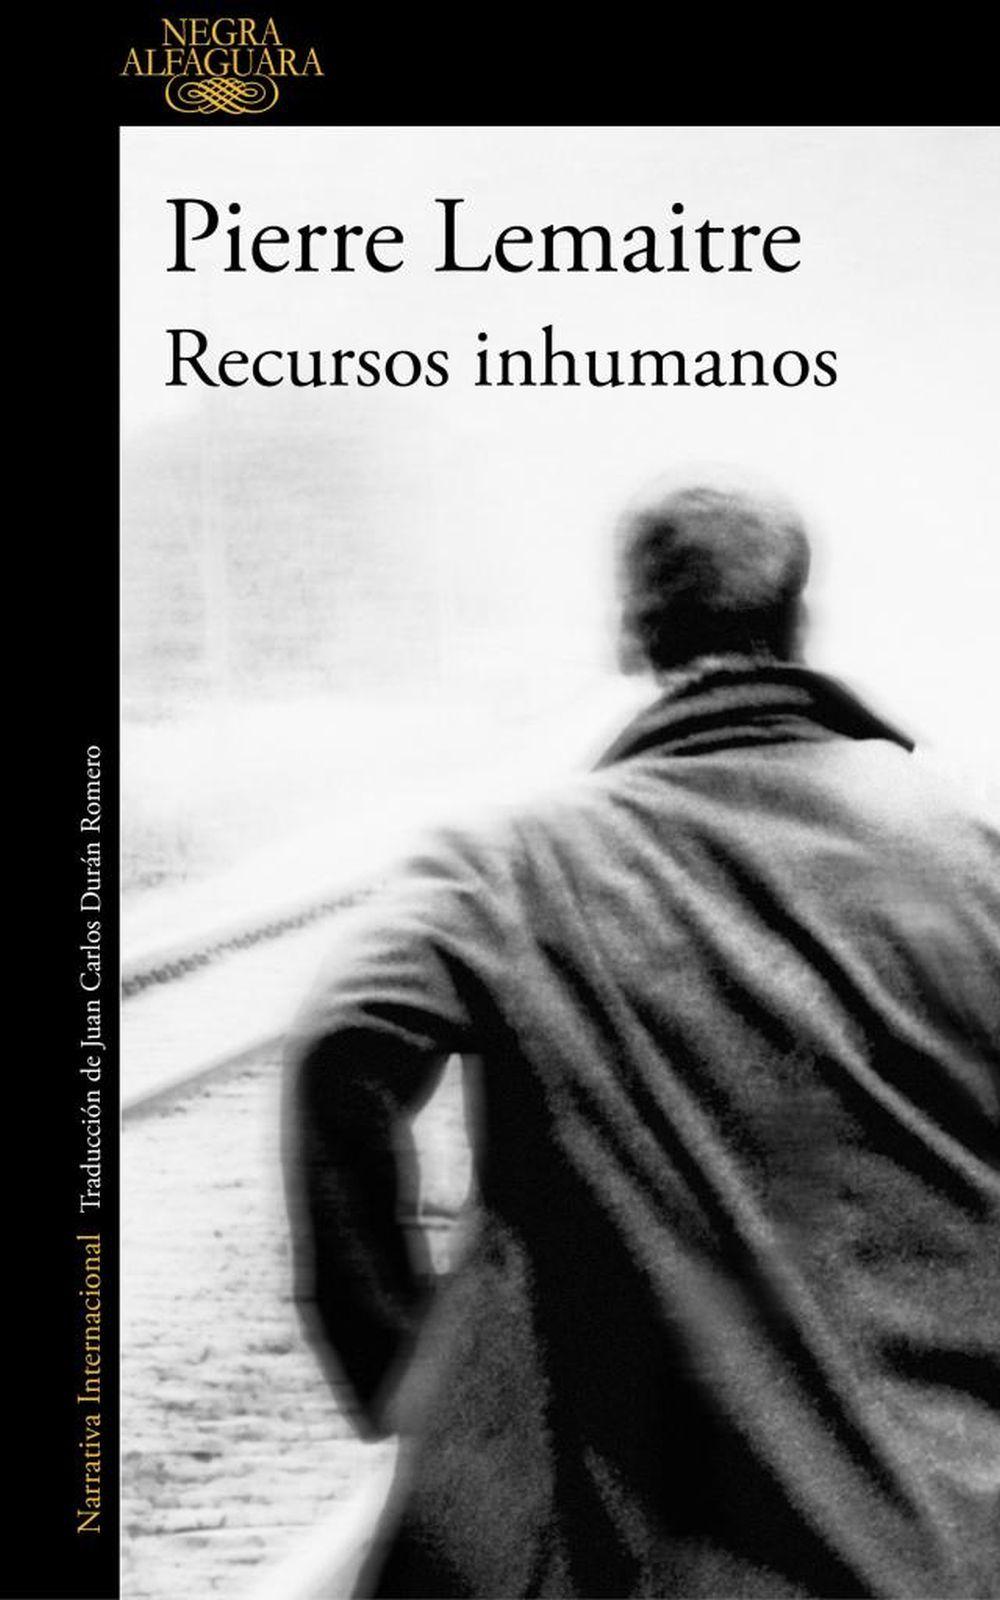 'Recursos Inhumanos', de Pierre Lemaitre